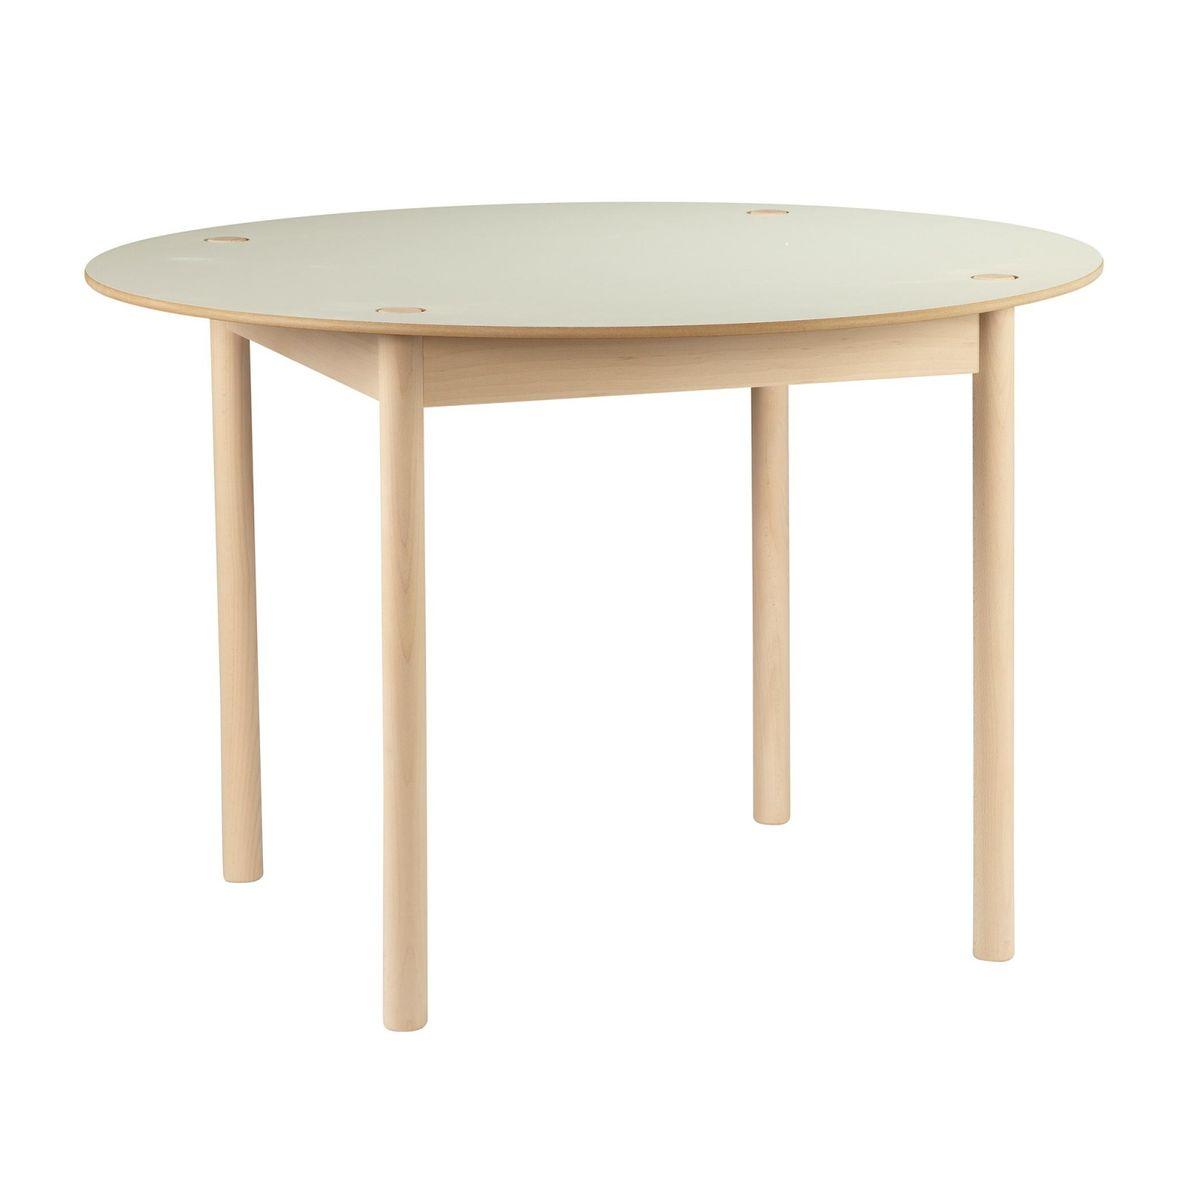 hay c44 table hay. Black Bedroom Furniture Sets. Home Design Ideas